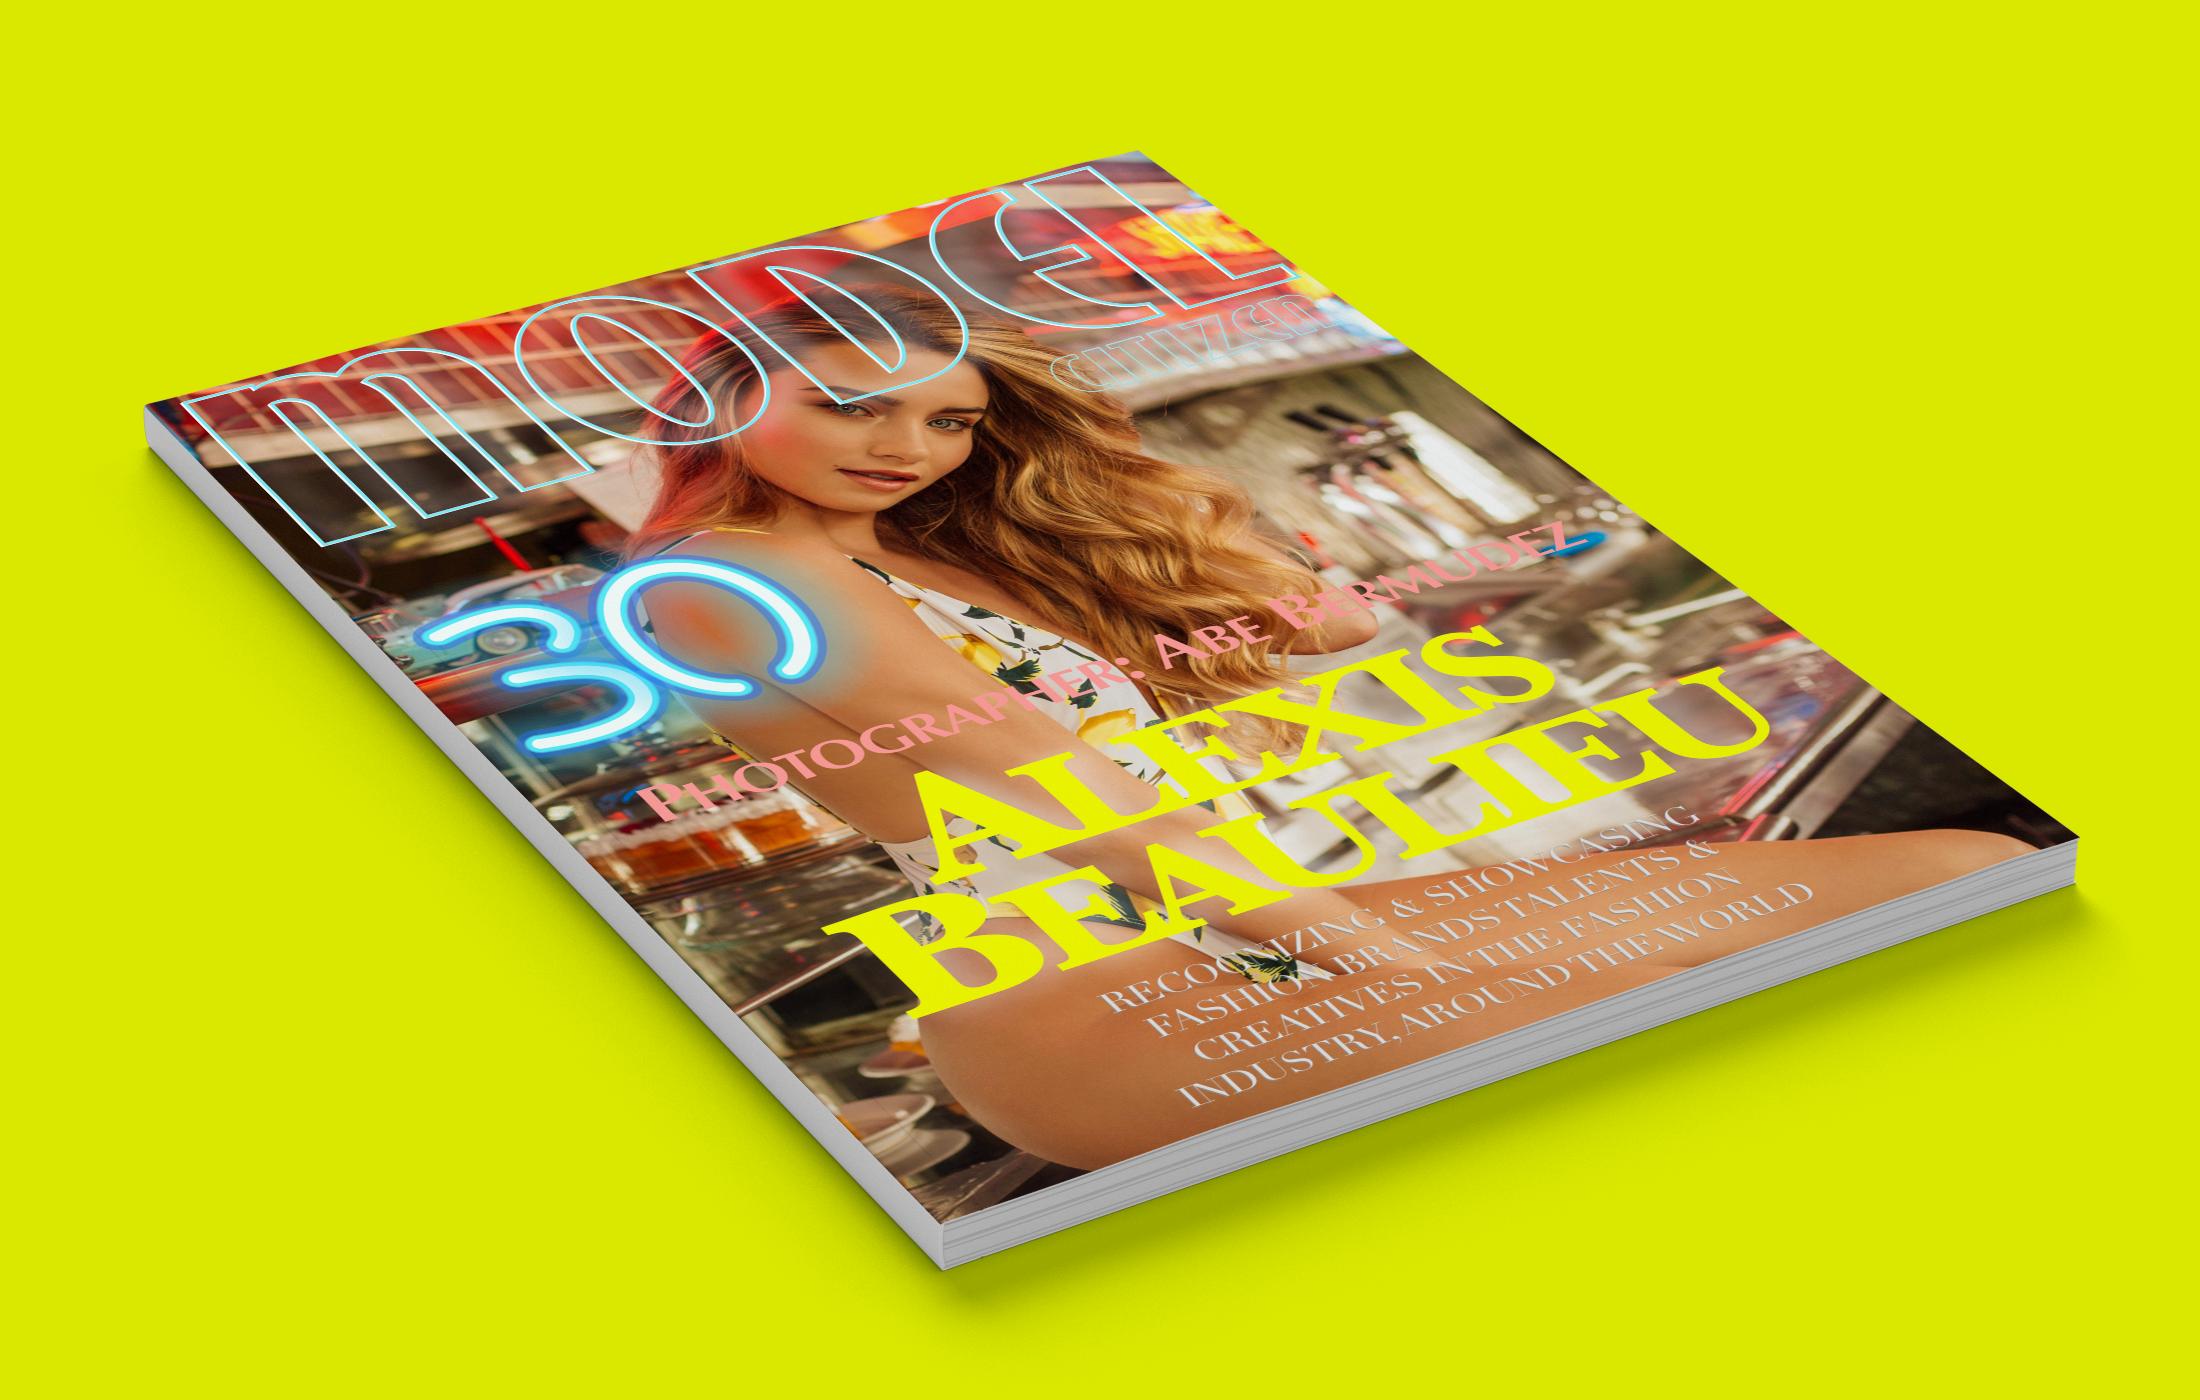 Model Citizen Magazine Issue 29, Macky Suson, Fashion Inclusion Now 1.png